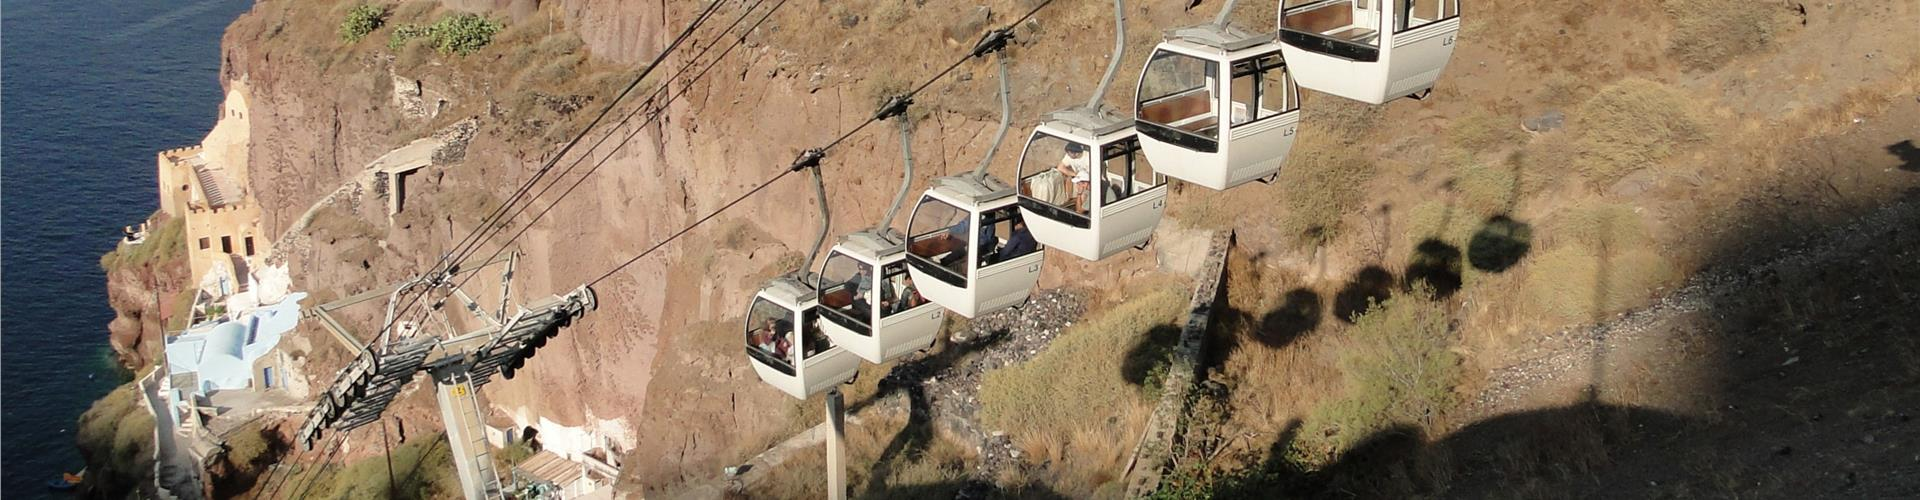 Santorini Cable Car - Attractions - Santorini